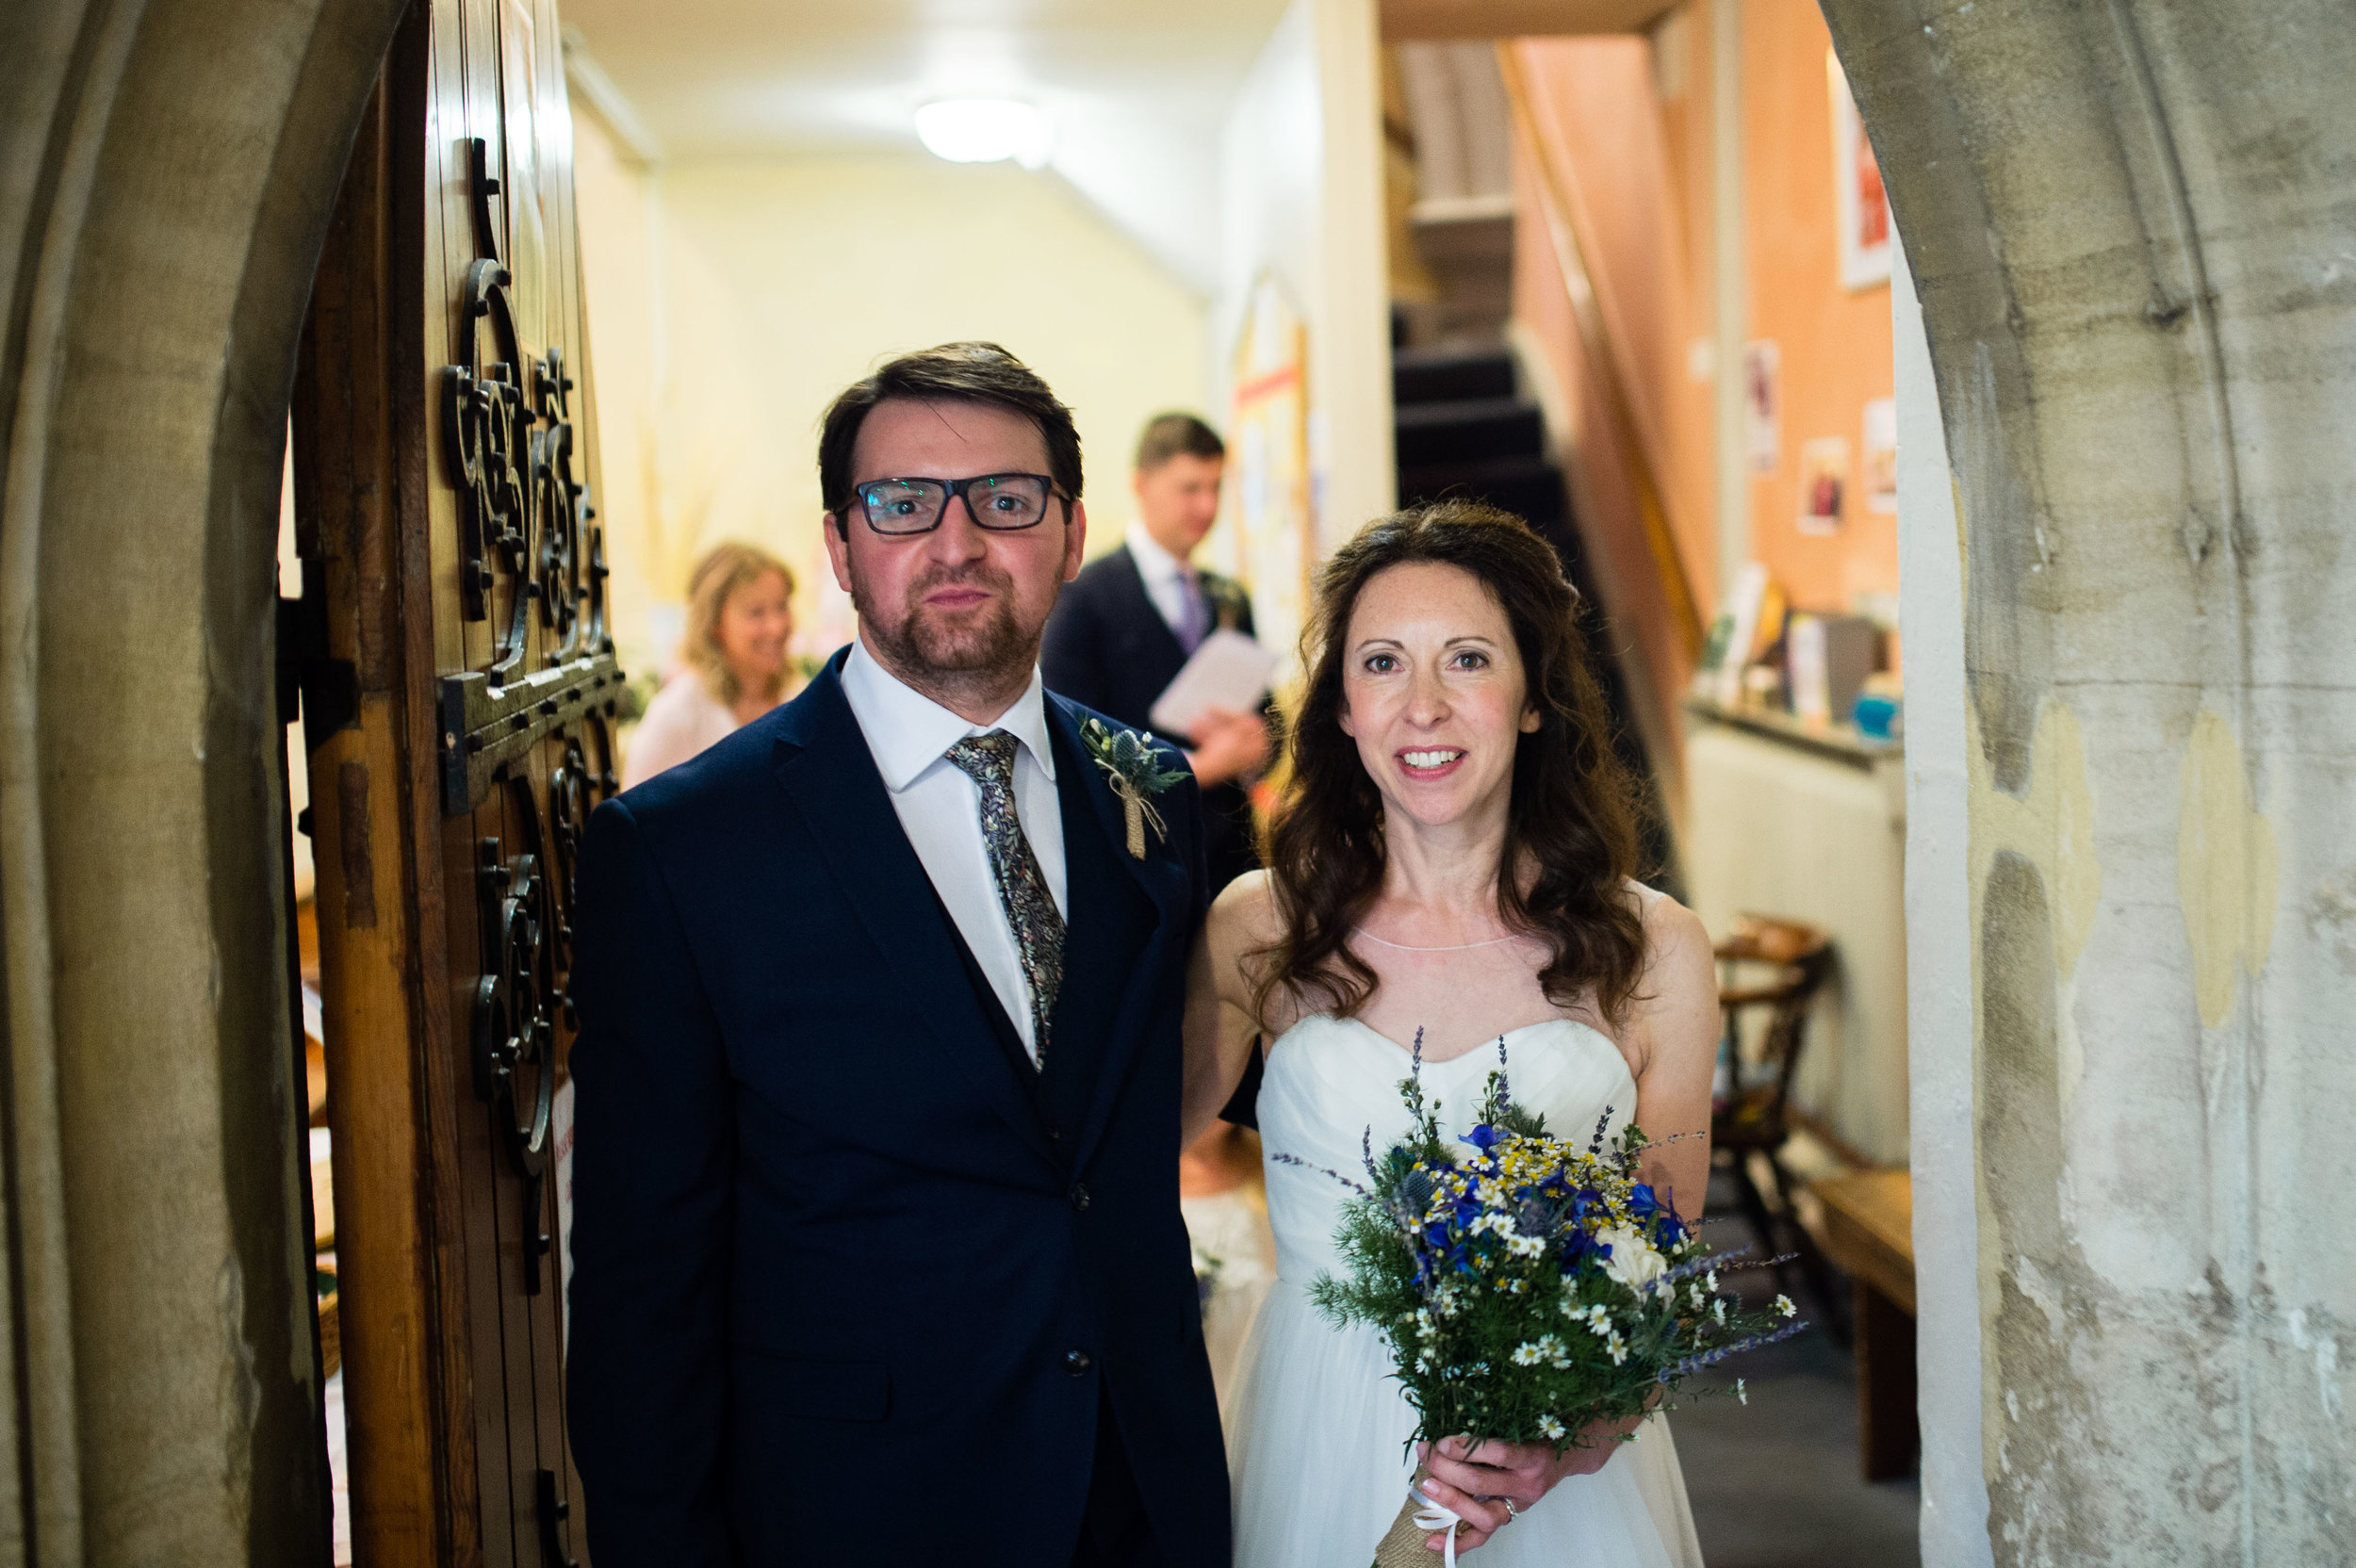 Beechfield house weddings - Abby and Greg (72 of 208).jpg